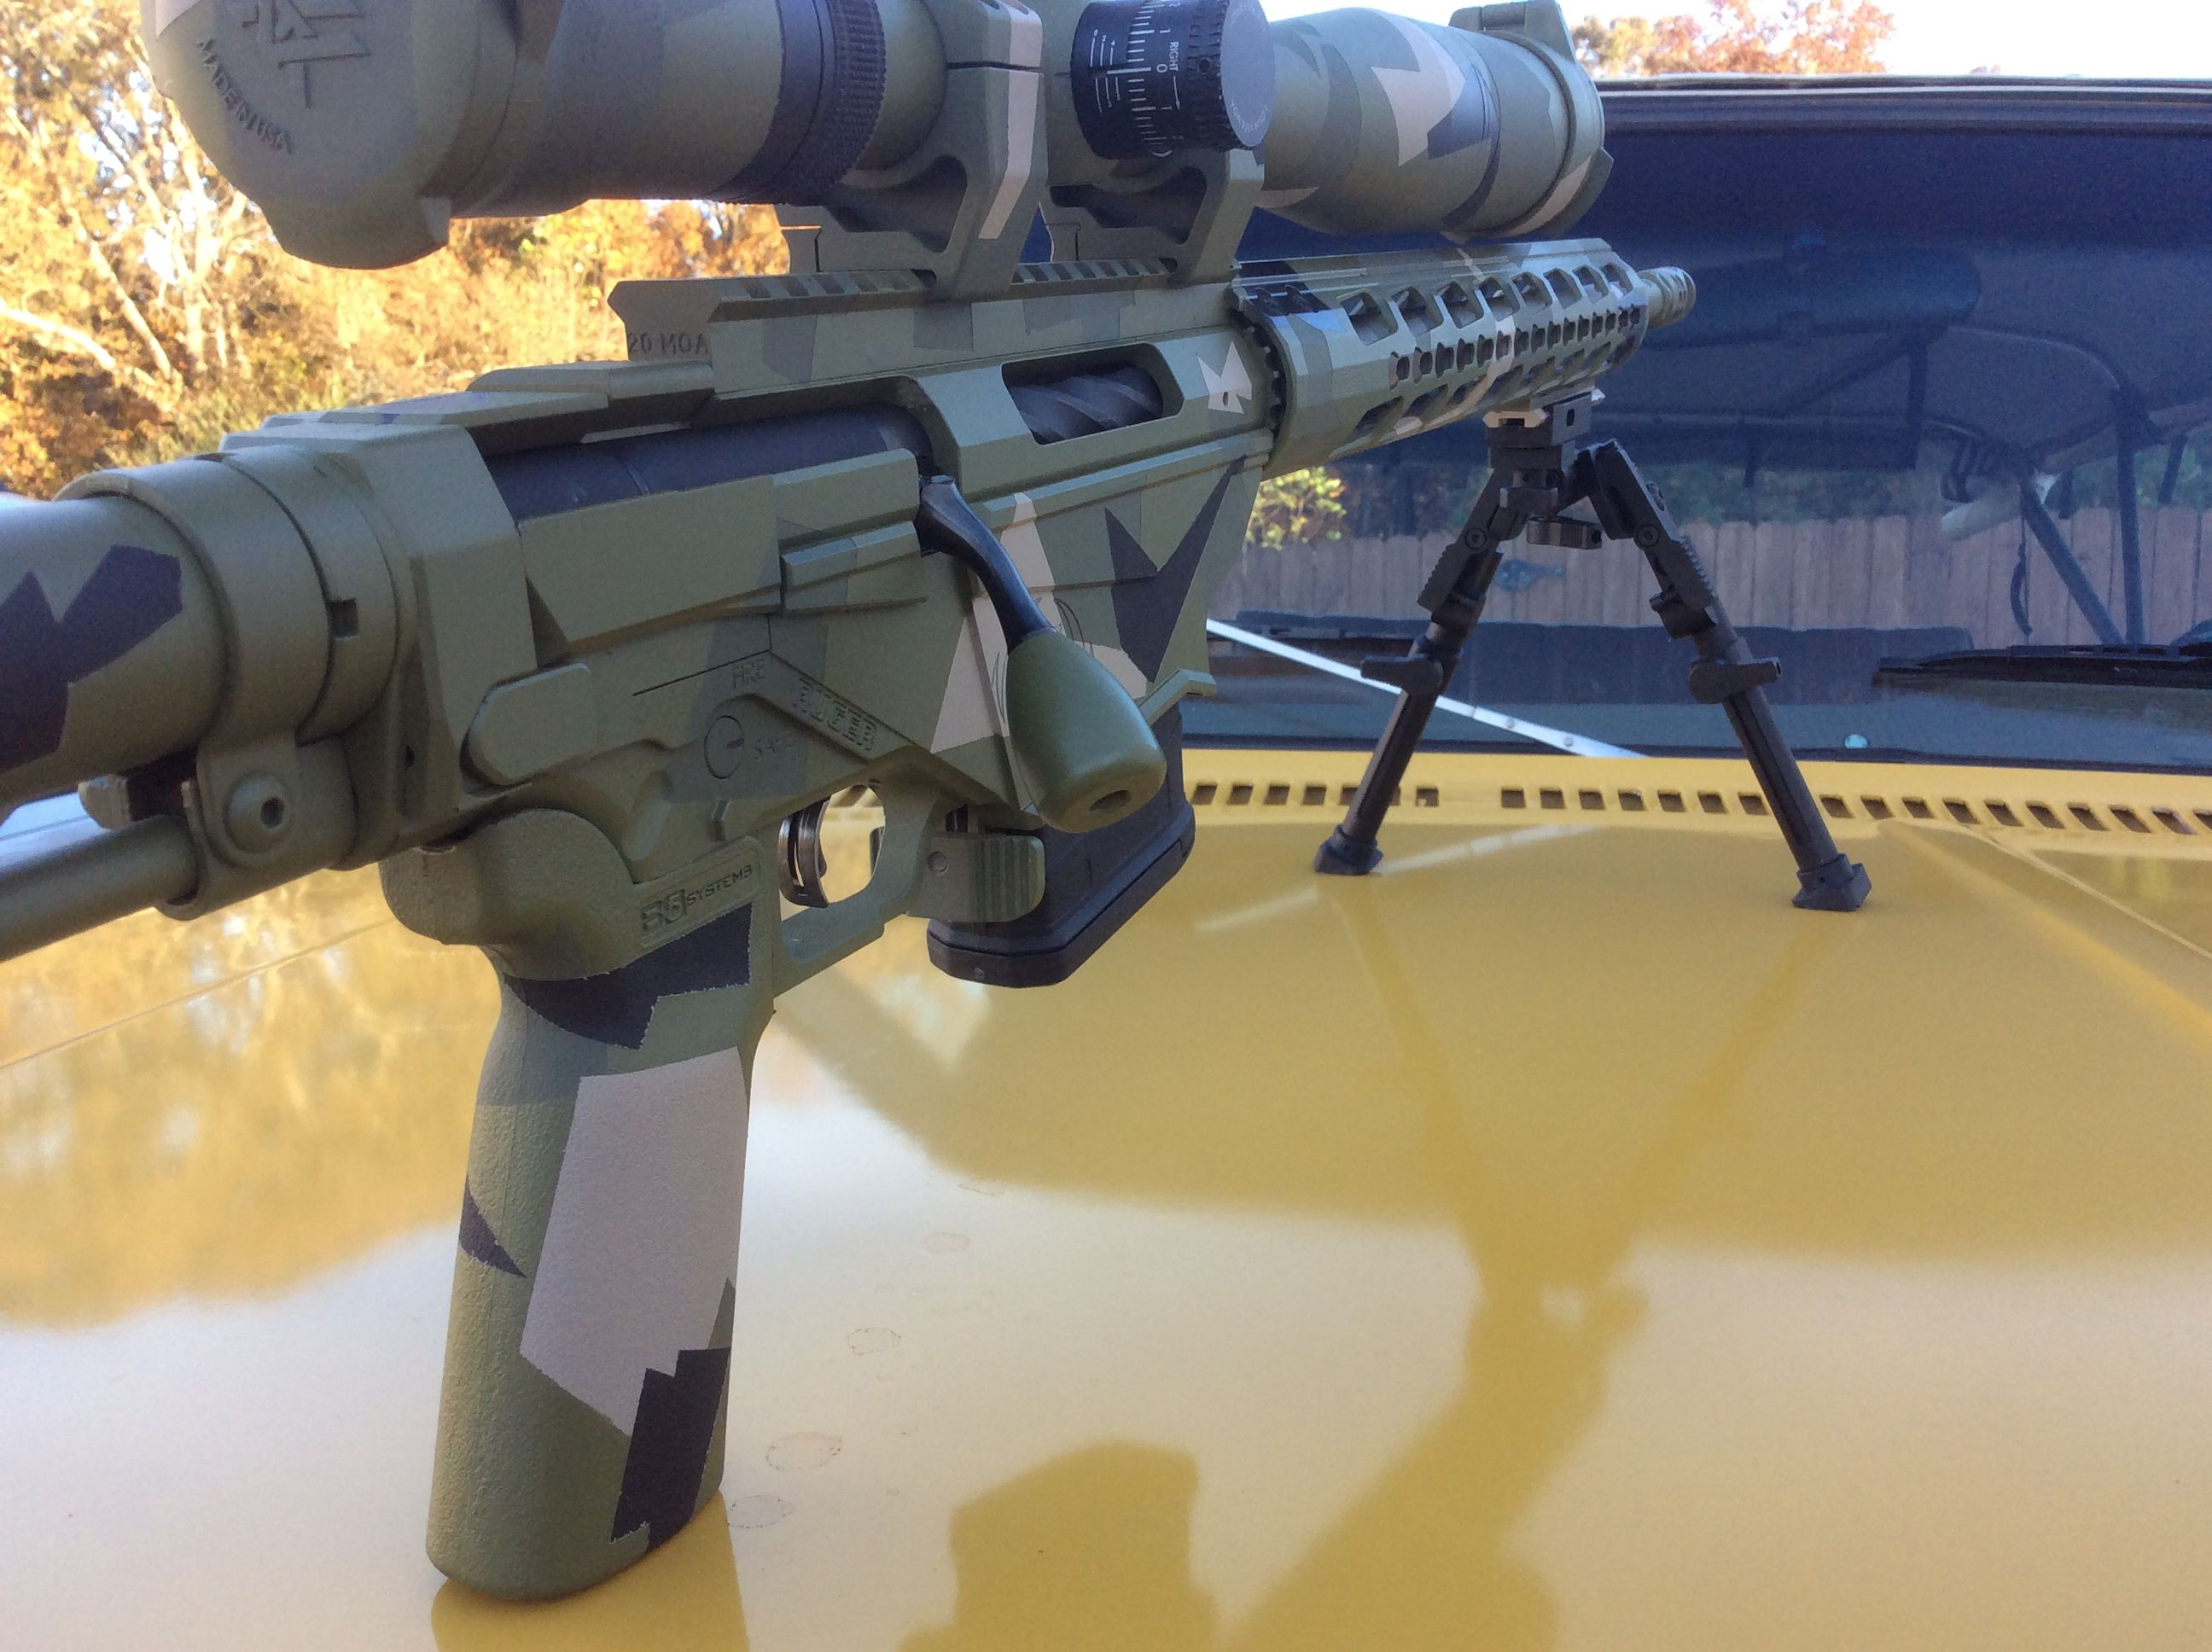 Ruger Precision Rifle in Swedish M90 camo